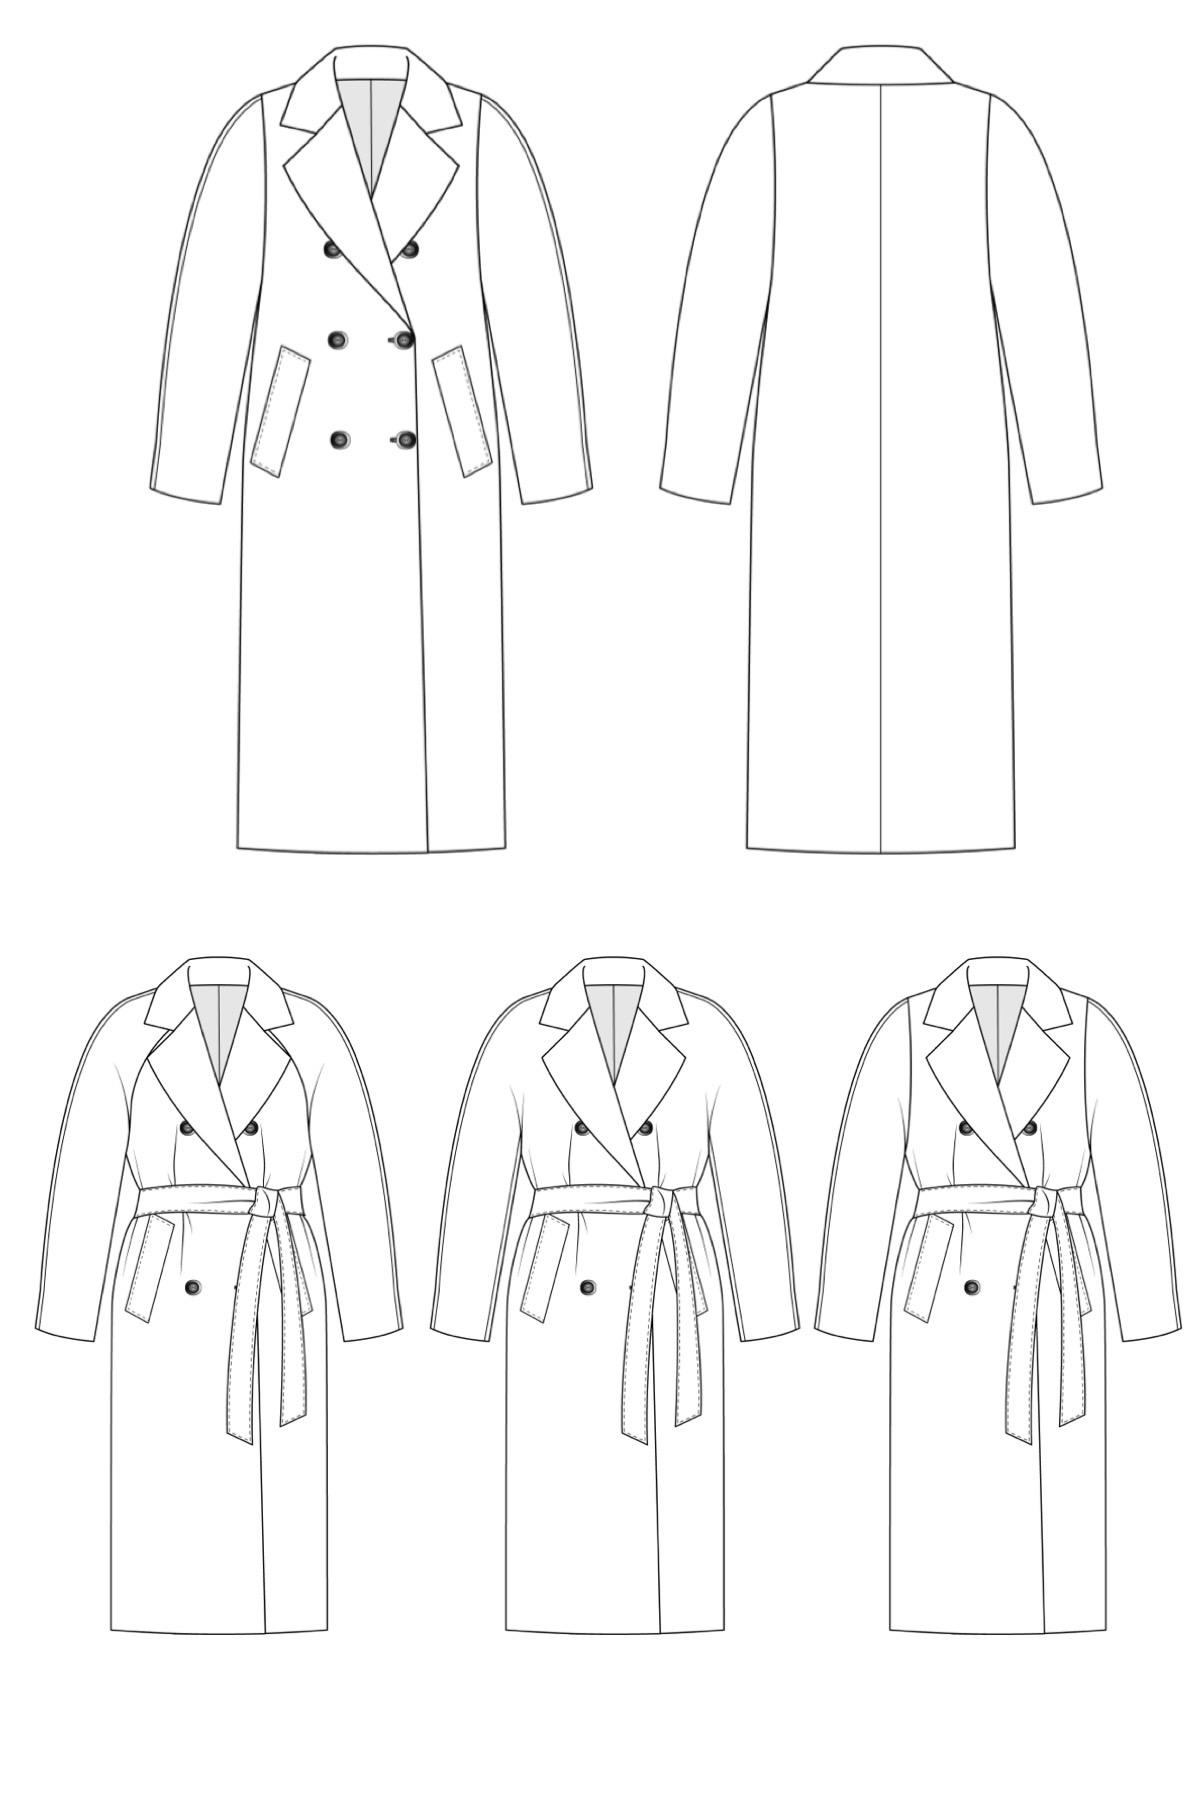 La'forme coat